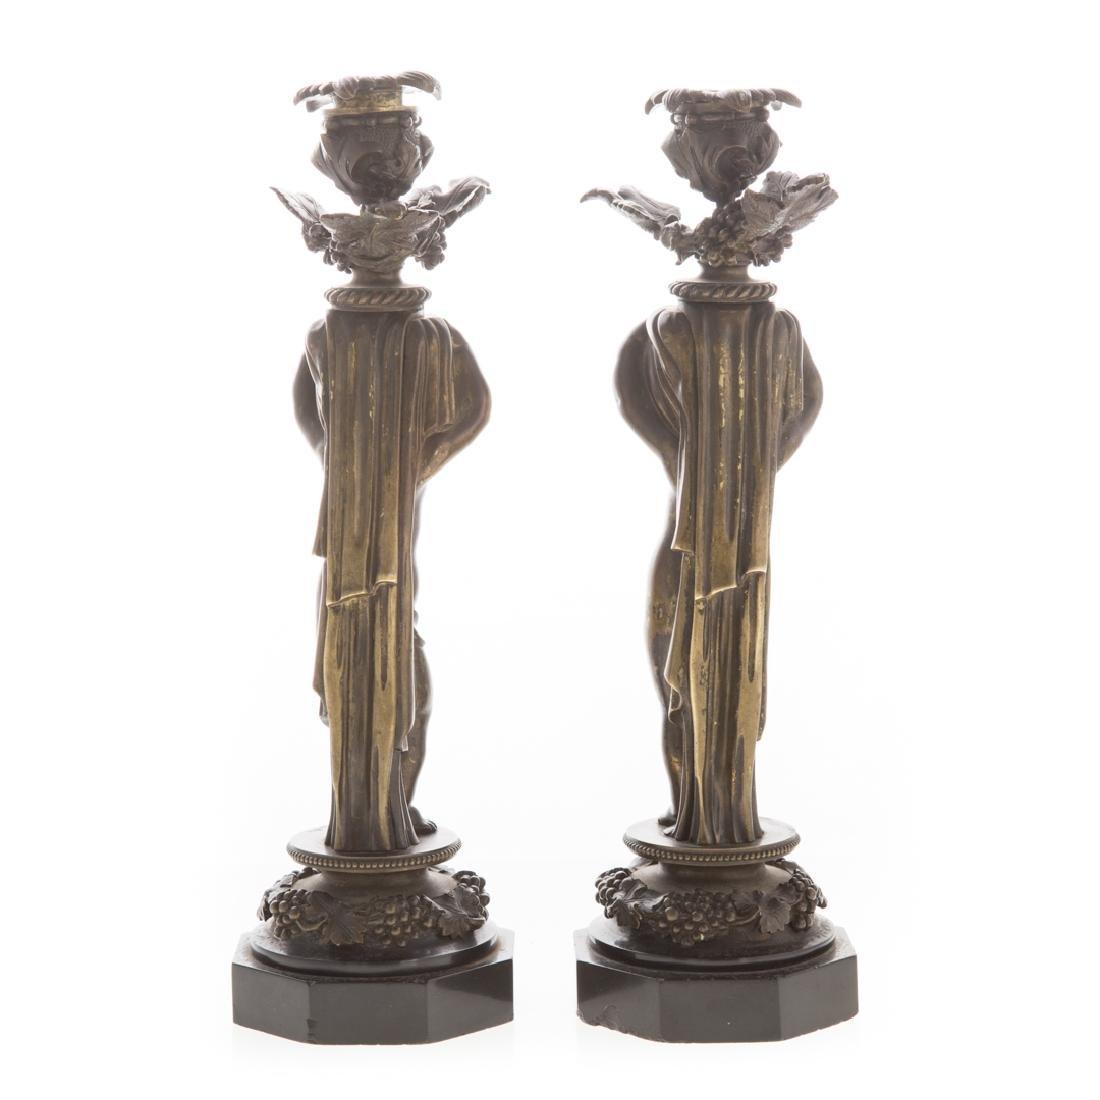 Pair of bronze putti candlesticks - 4